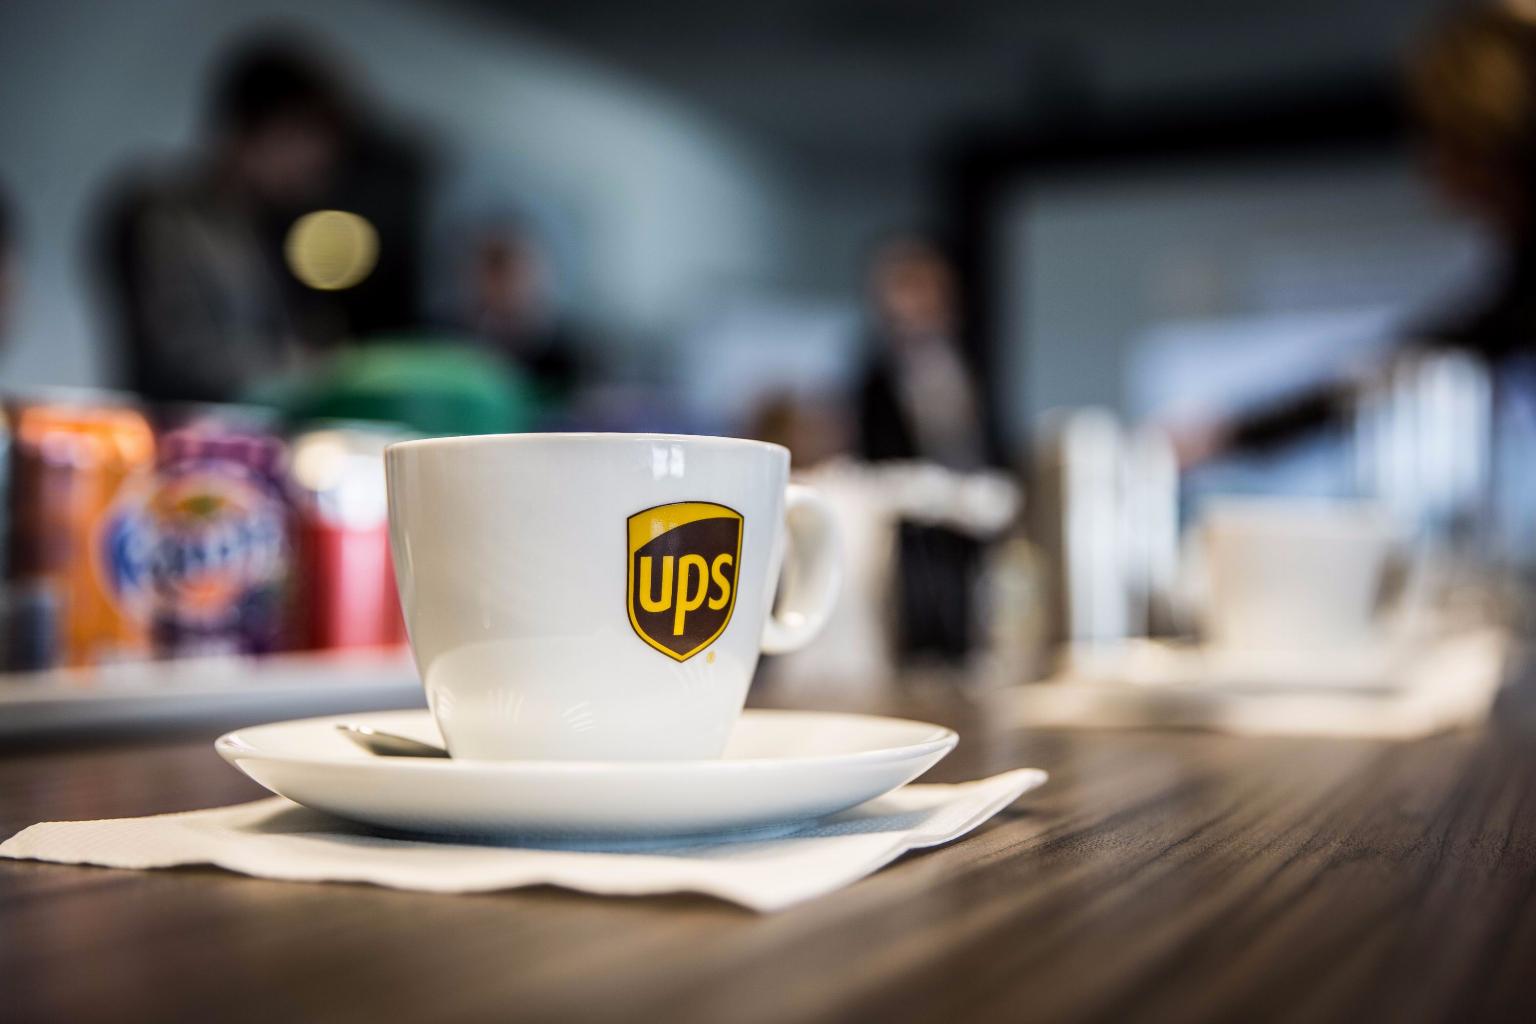 UPS - 000